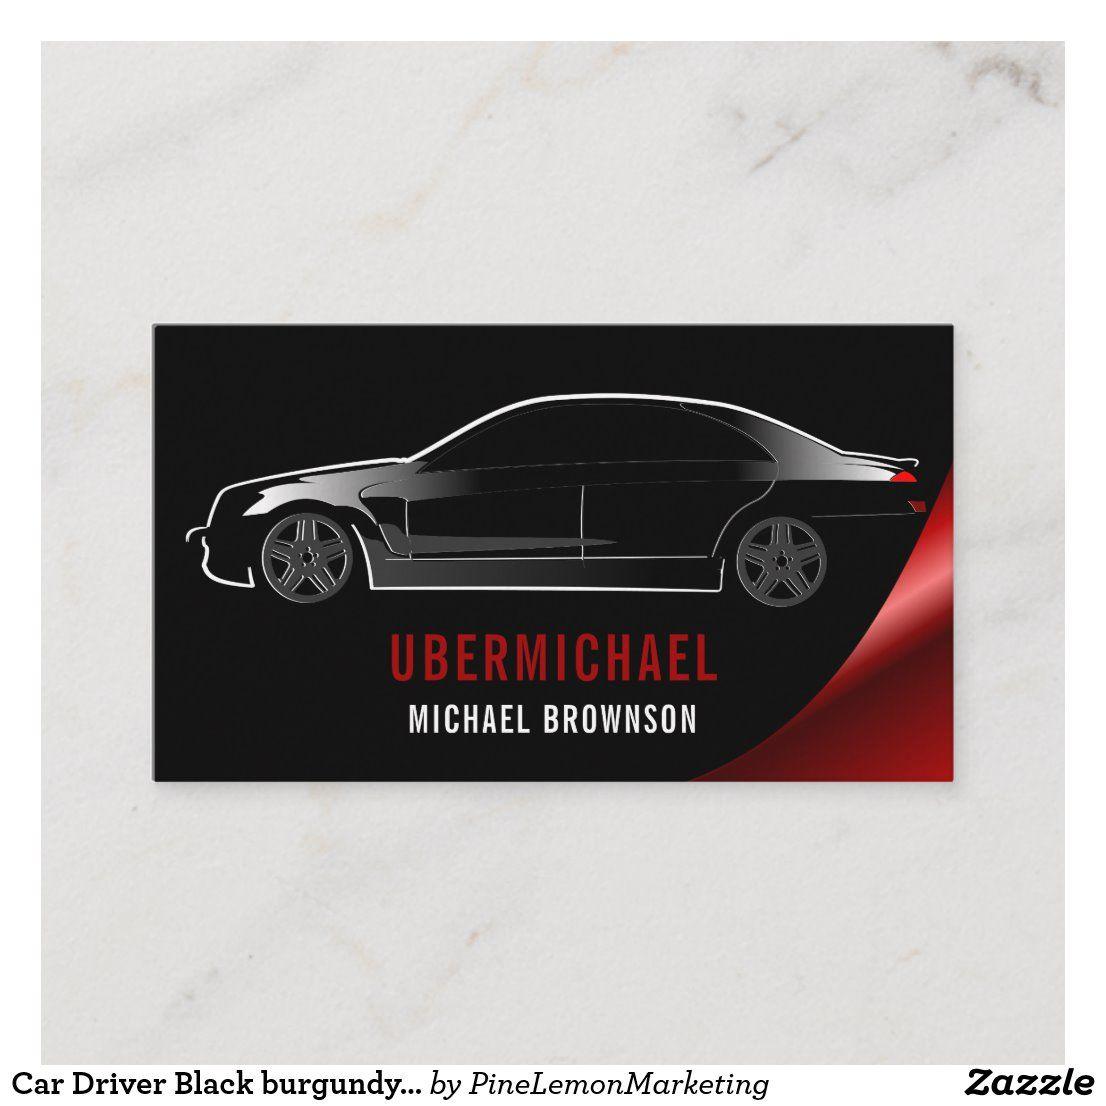 Car Driver Black burgundy Auto Repair Rent Business Card